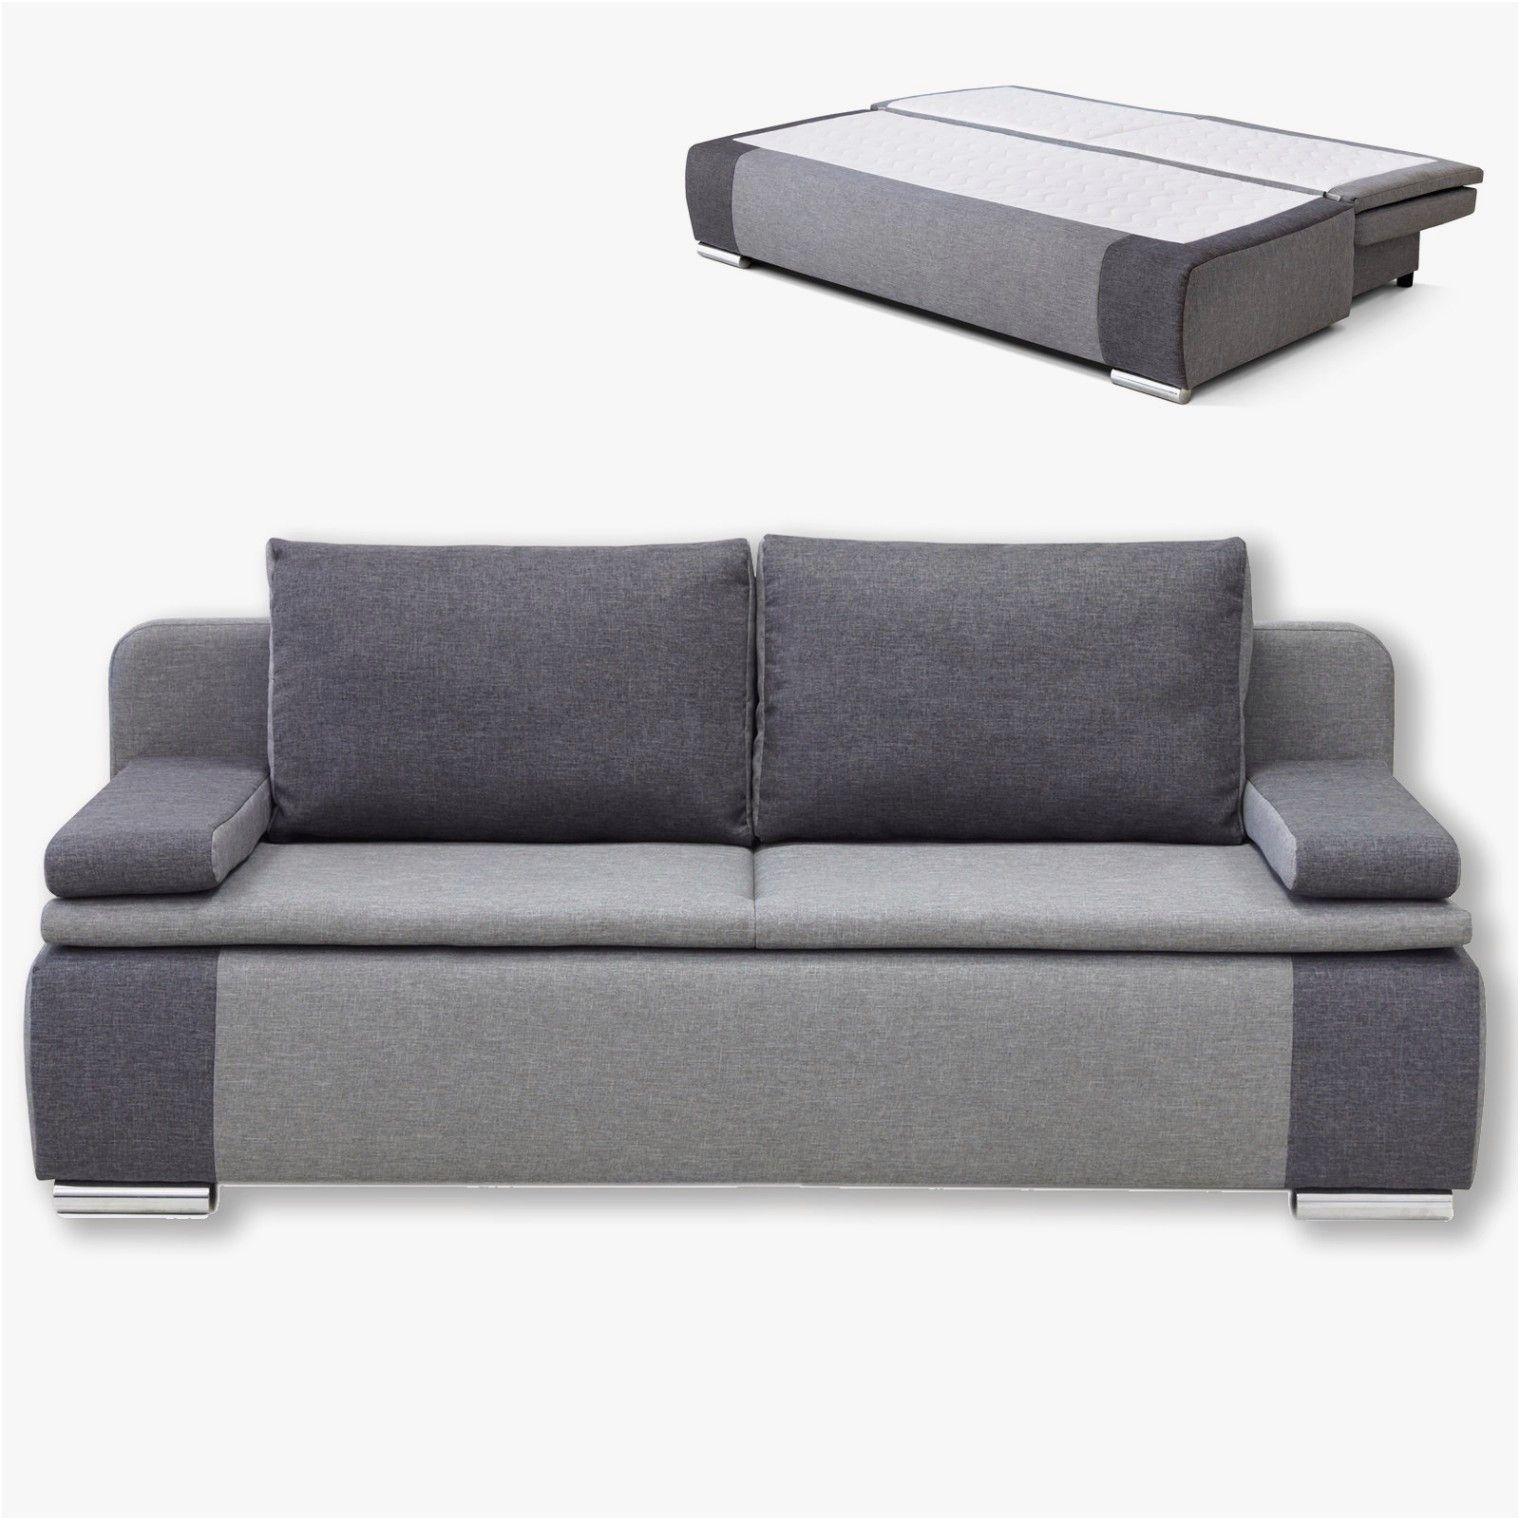 71 Makellos Recamiere Gunstig Furniture Design Living Room